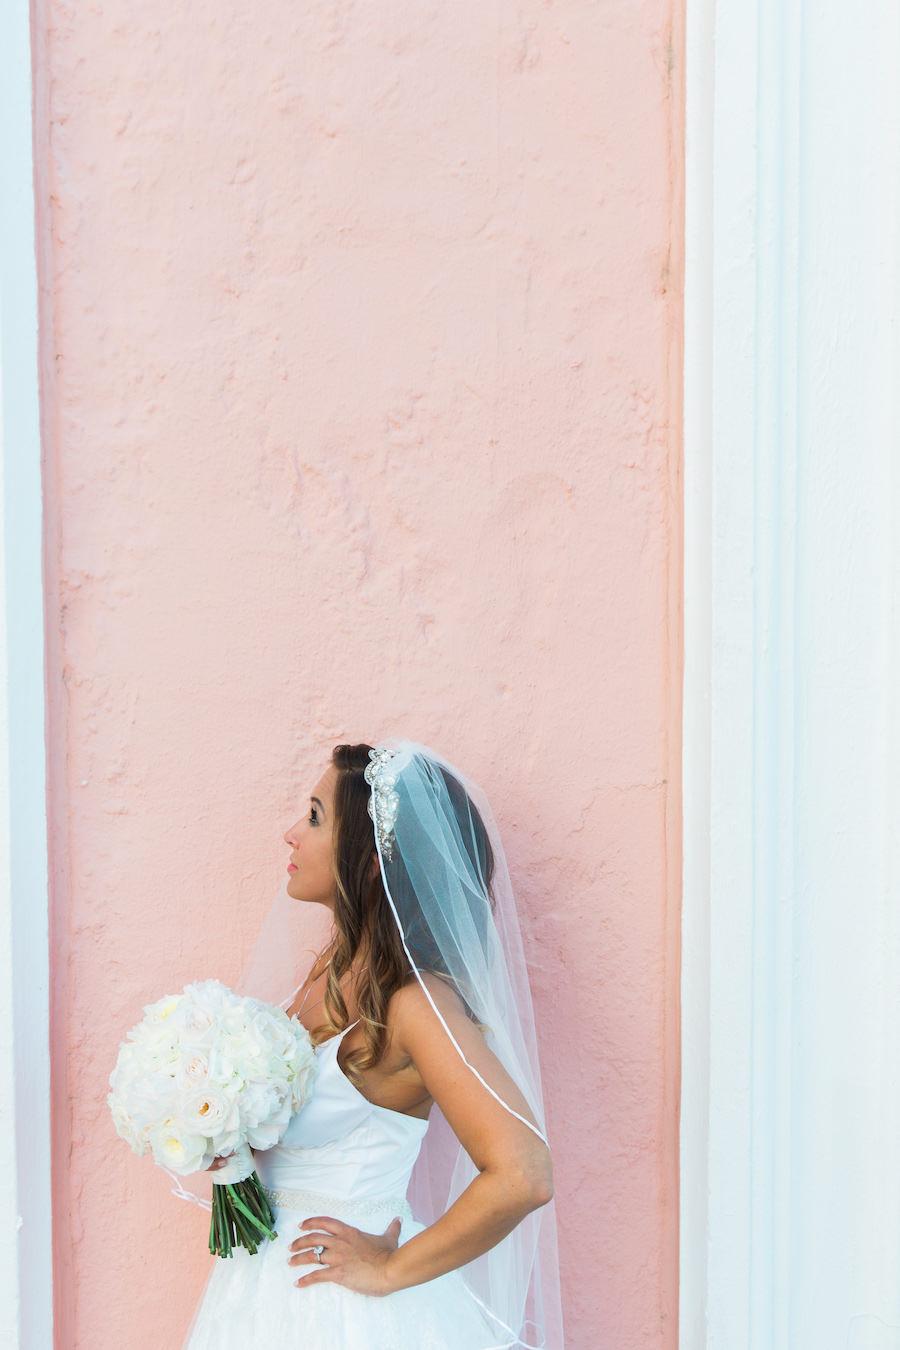 St. Pete Bride Wedding Portrait with White Peony Bouquet